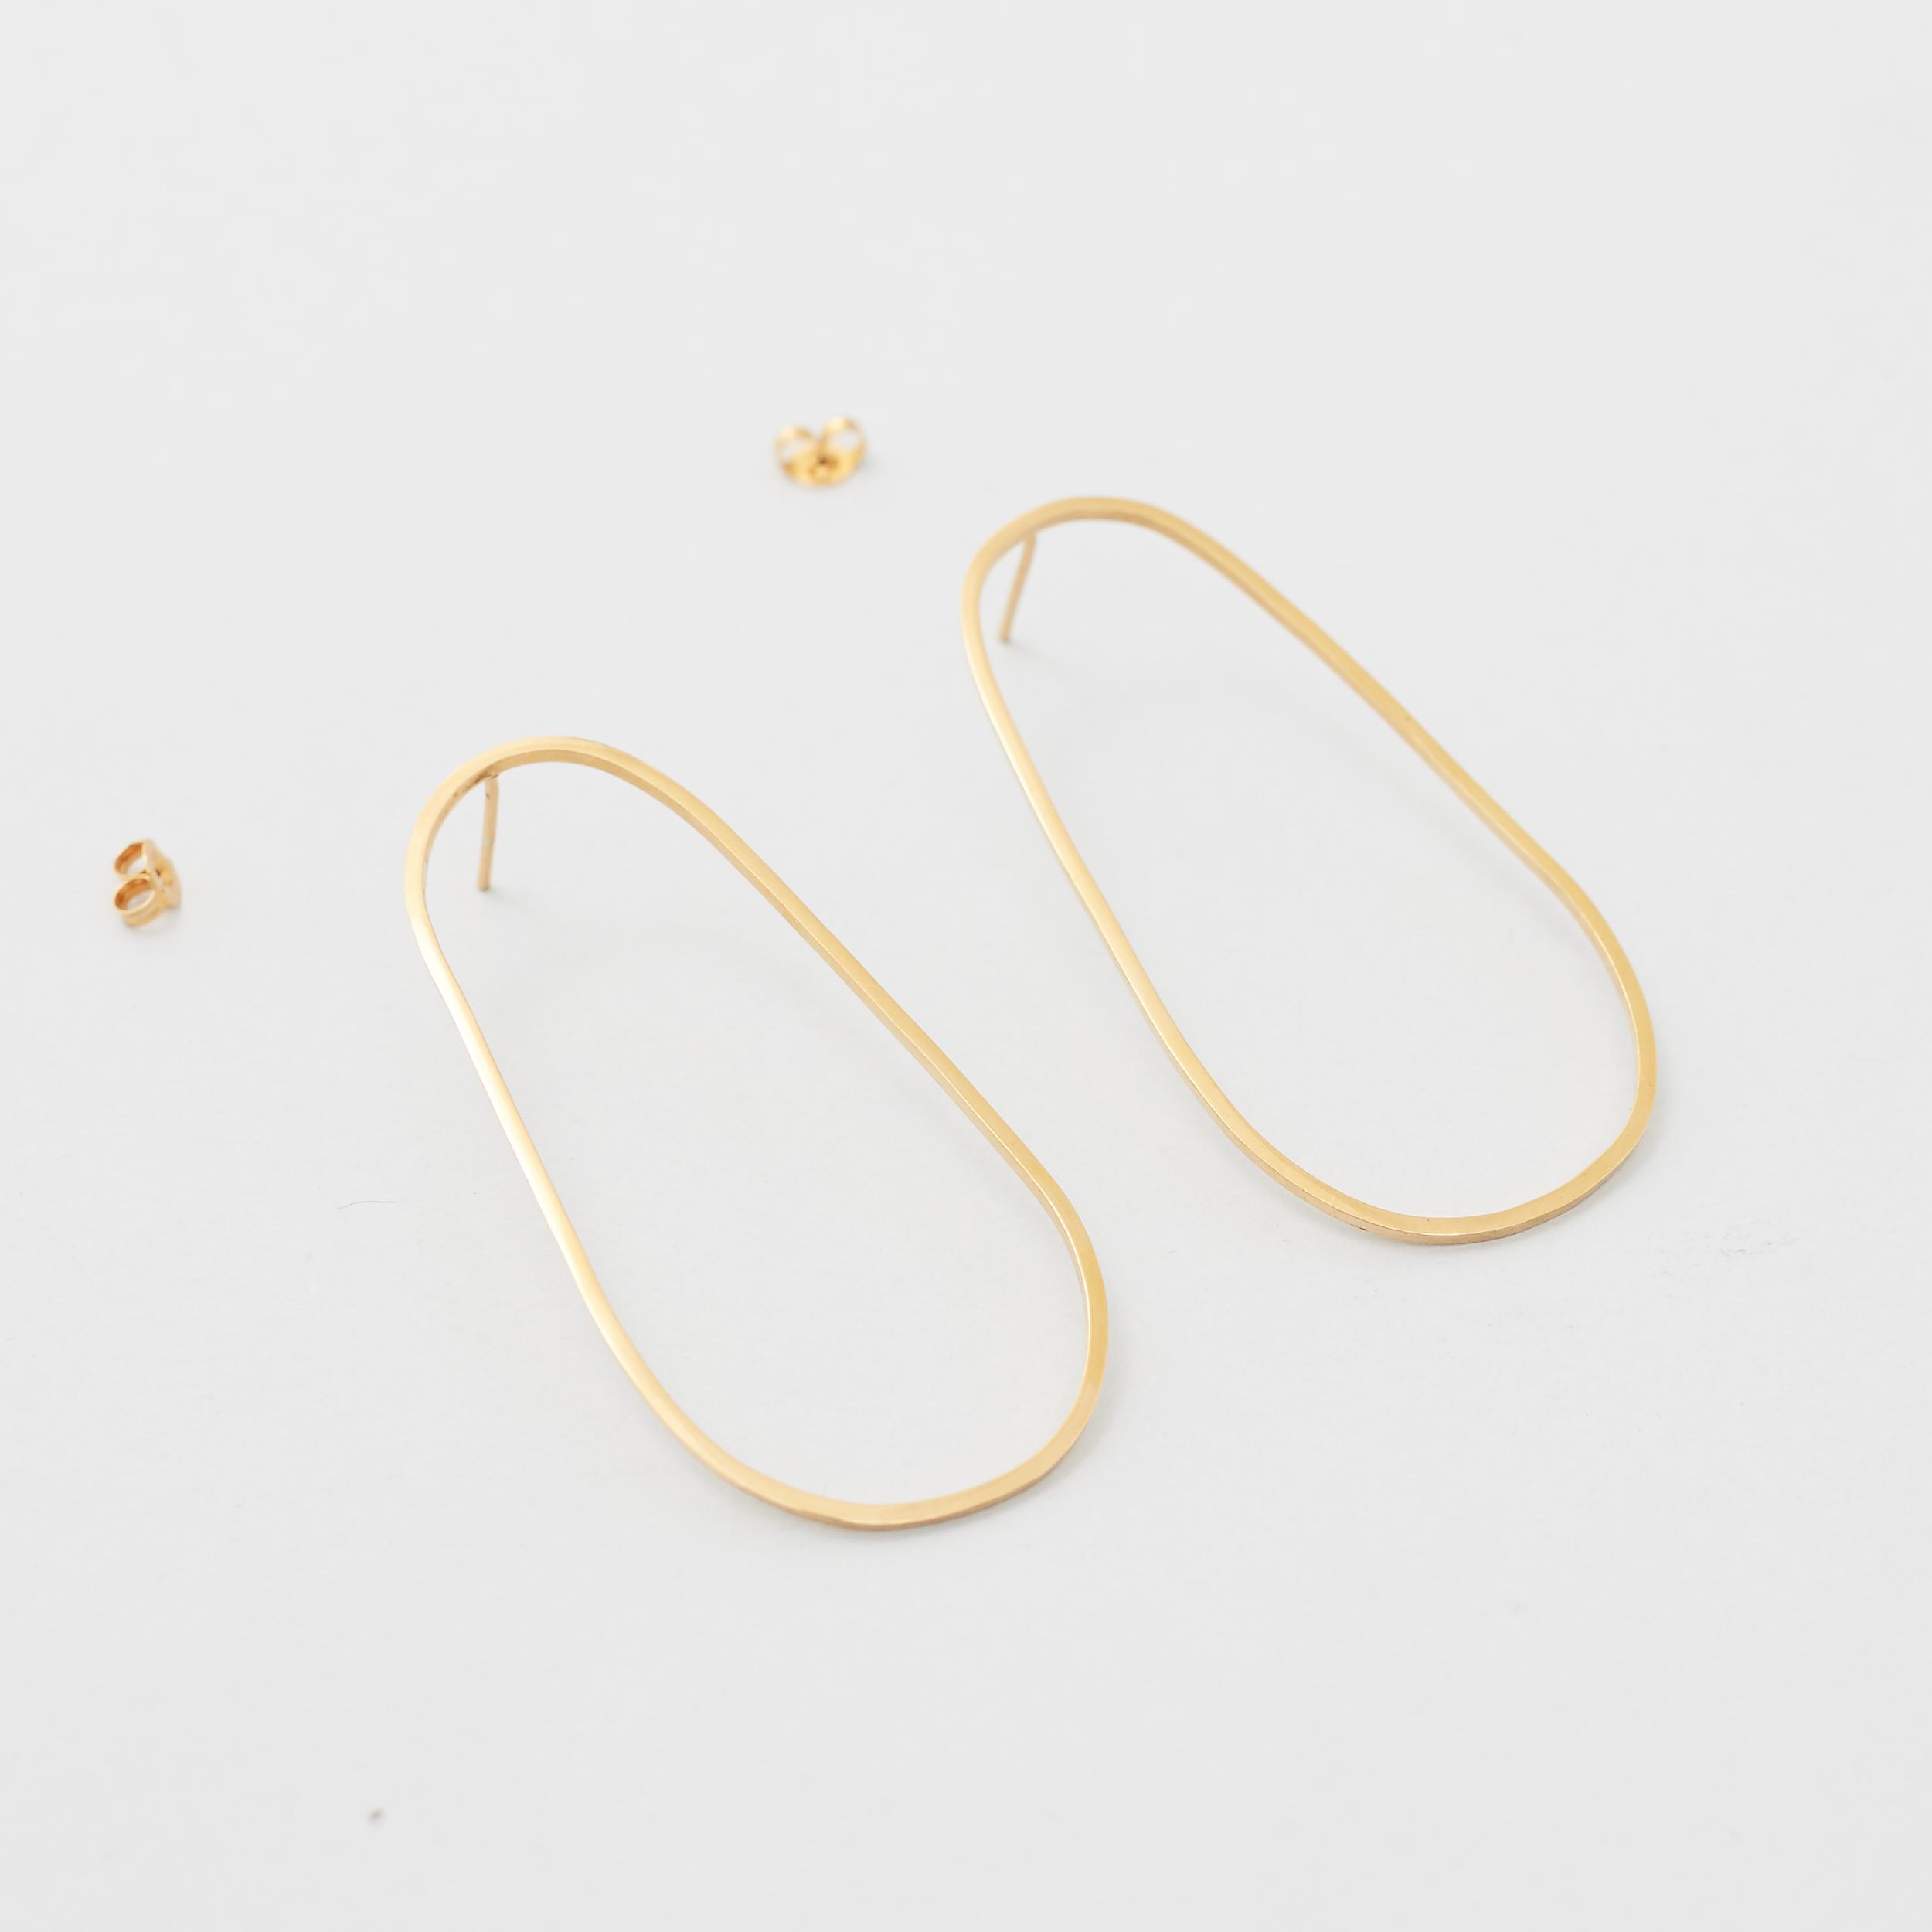 MHD_AW17_MAY- 10-Jewellery.jpg